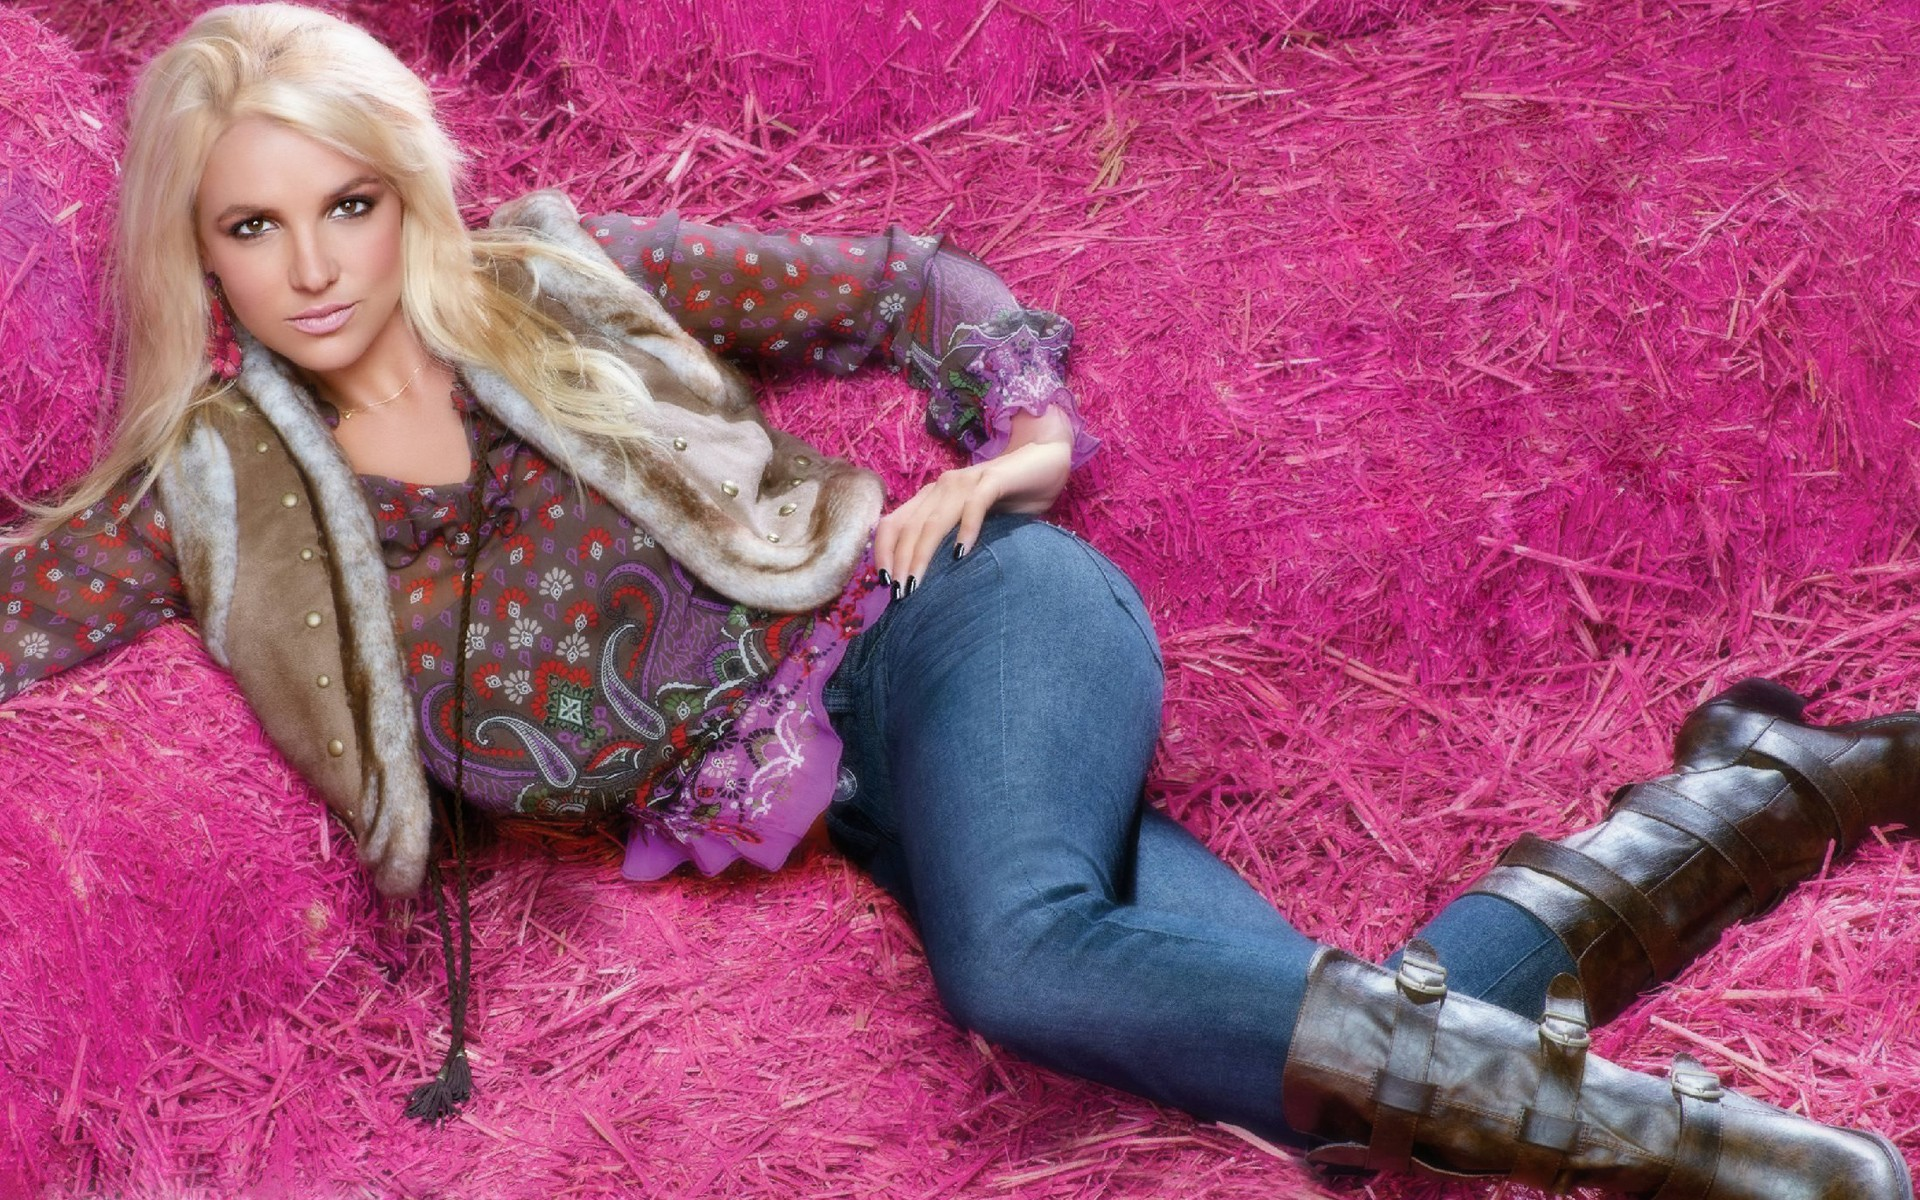 Britney Spears Pink wallpaper• PoPoPics.com